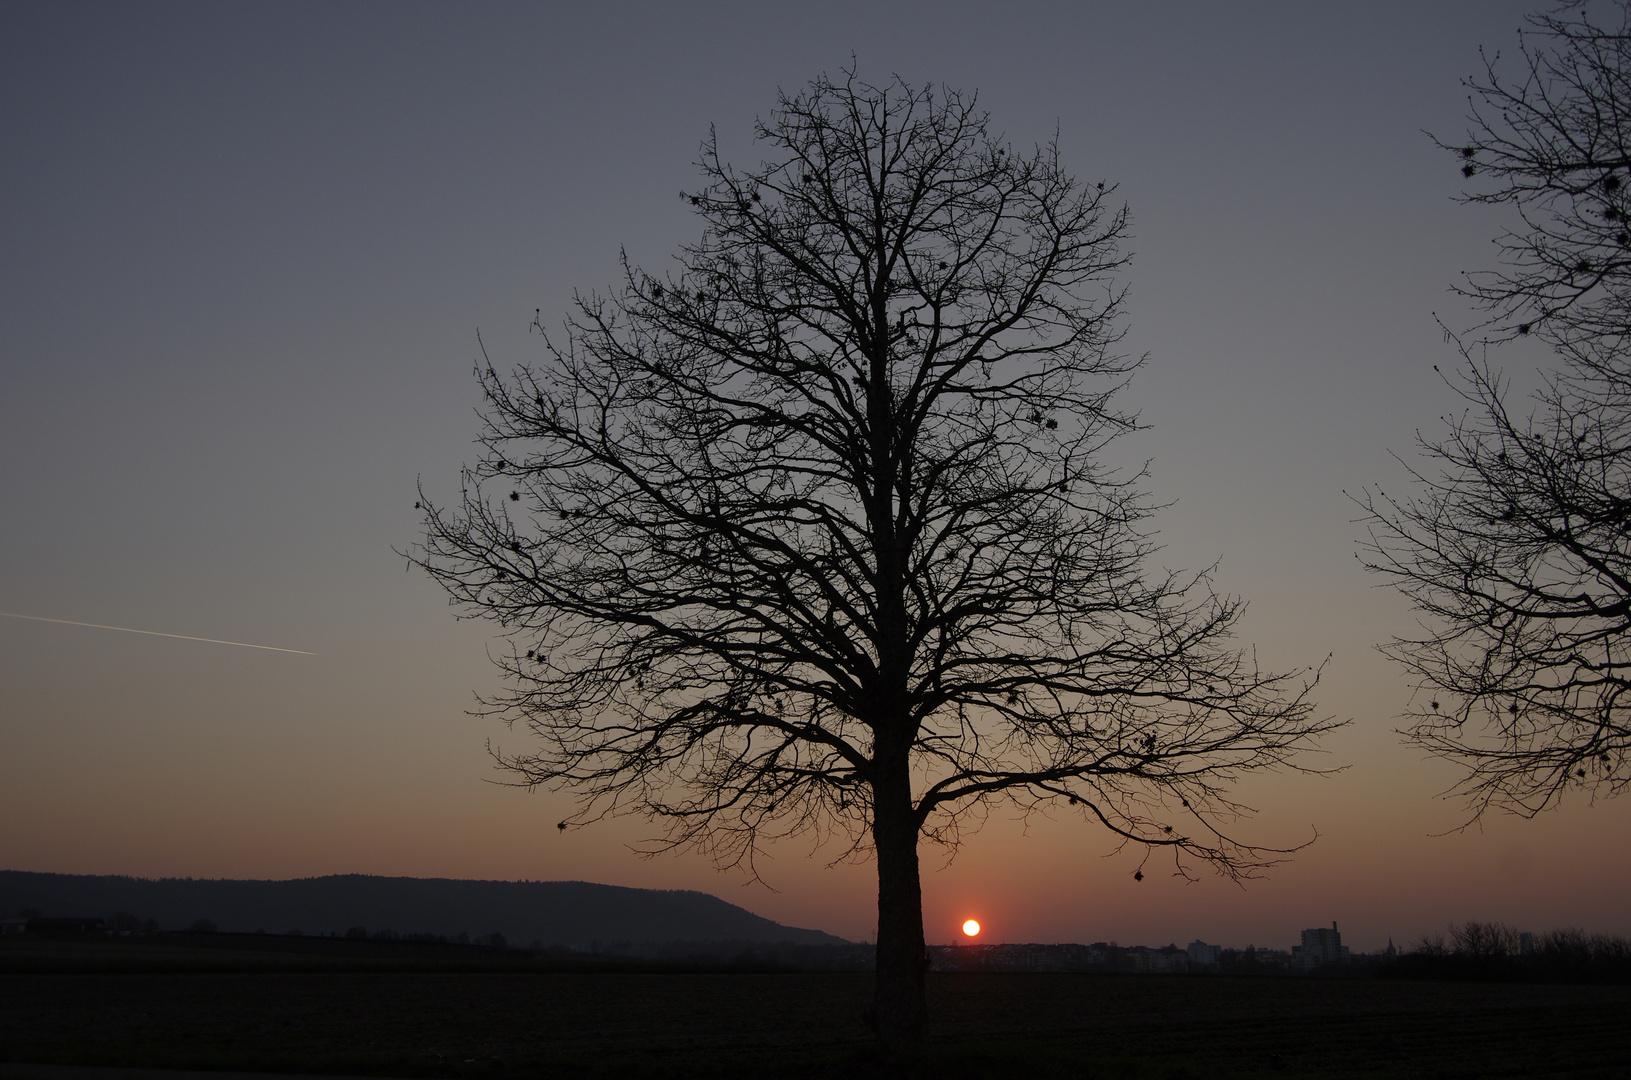 Baum-Traum